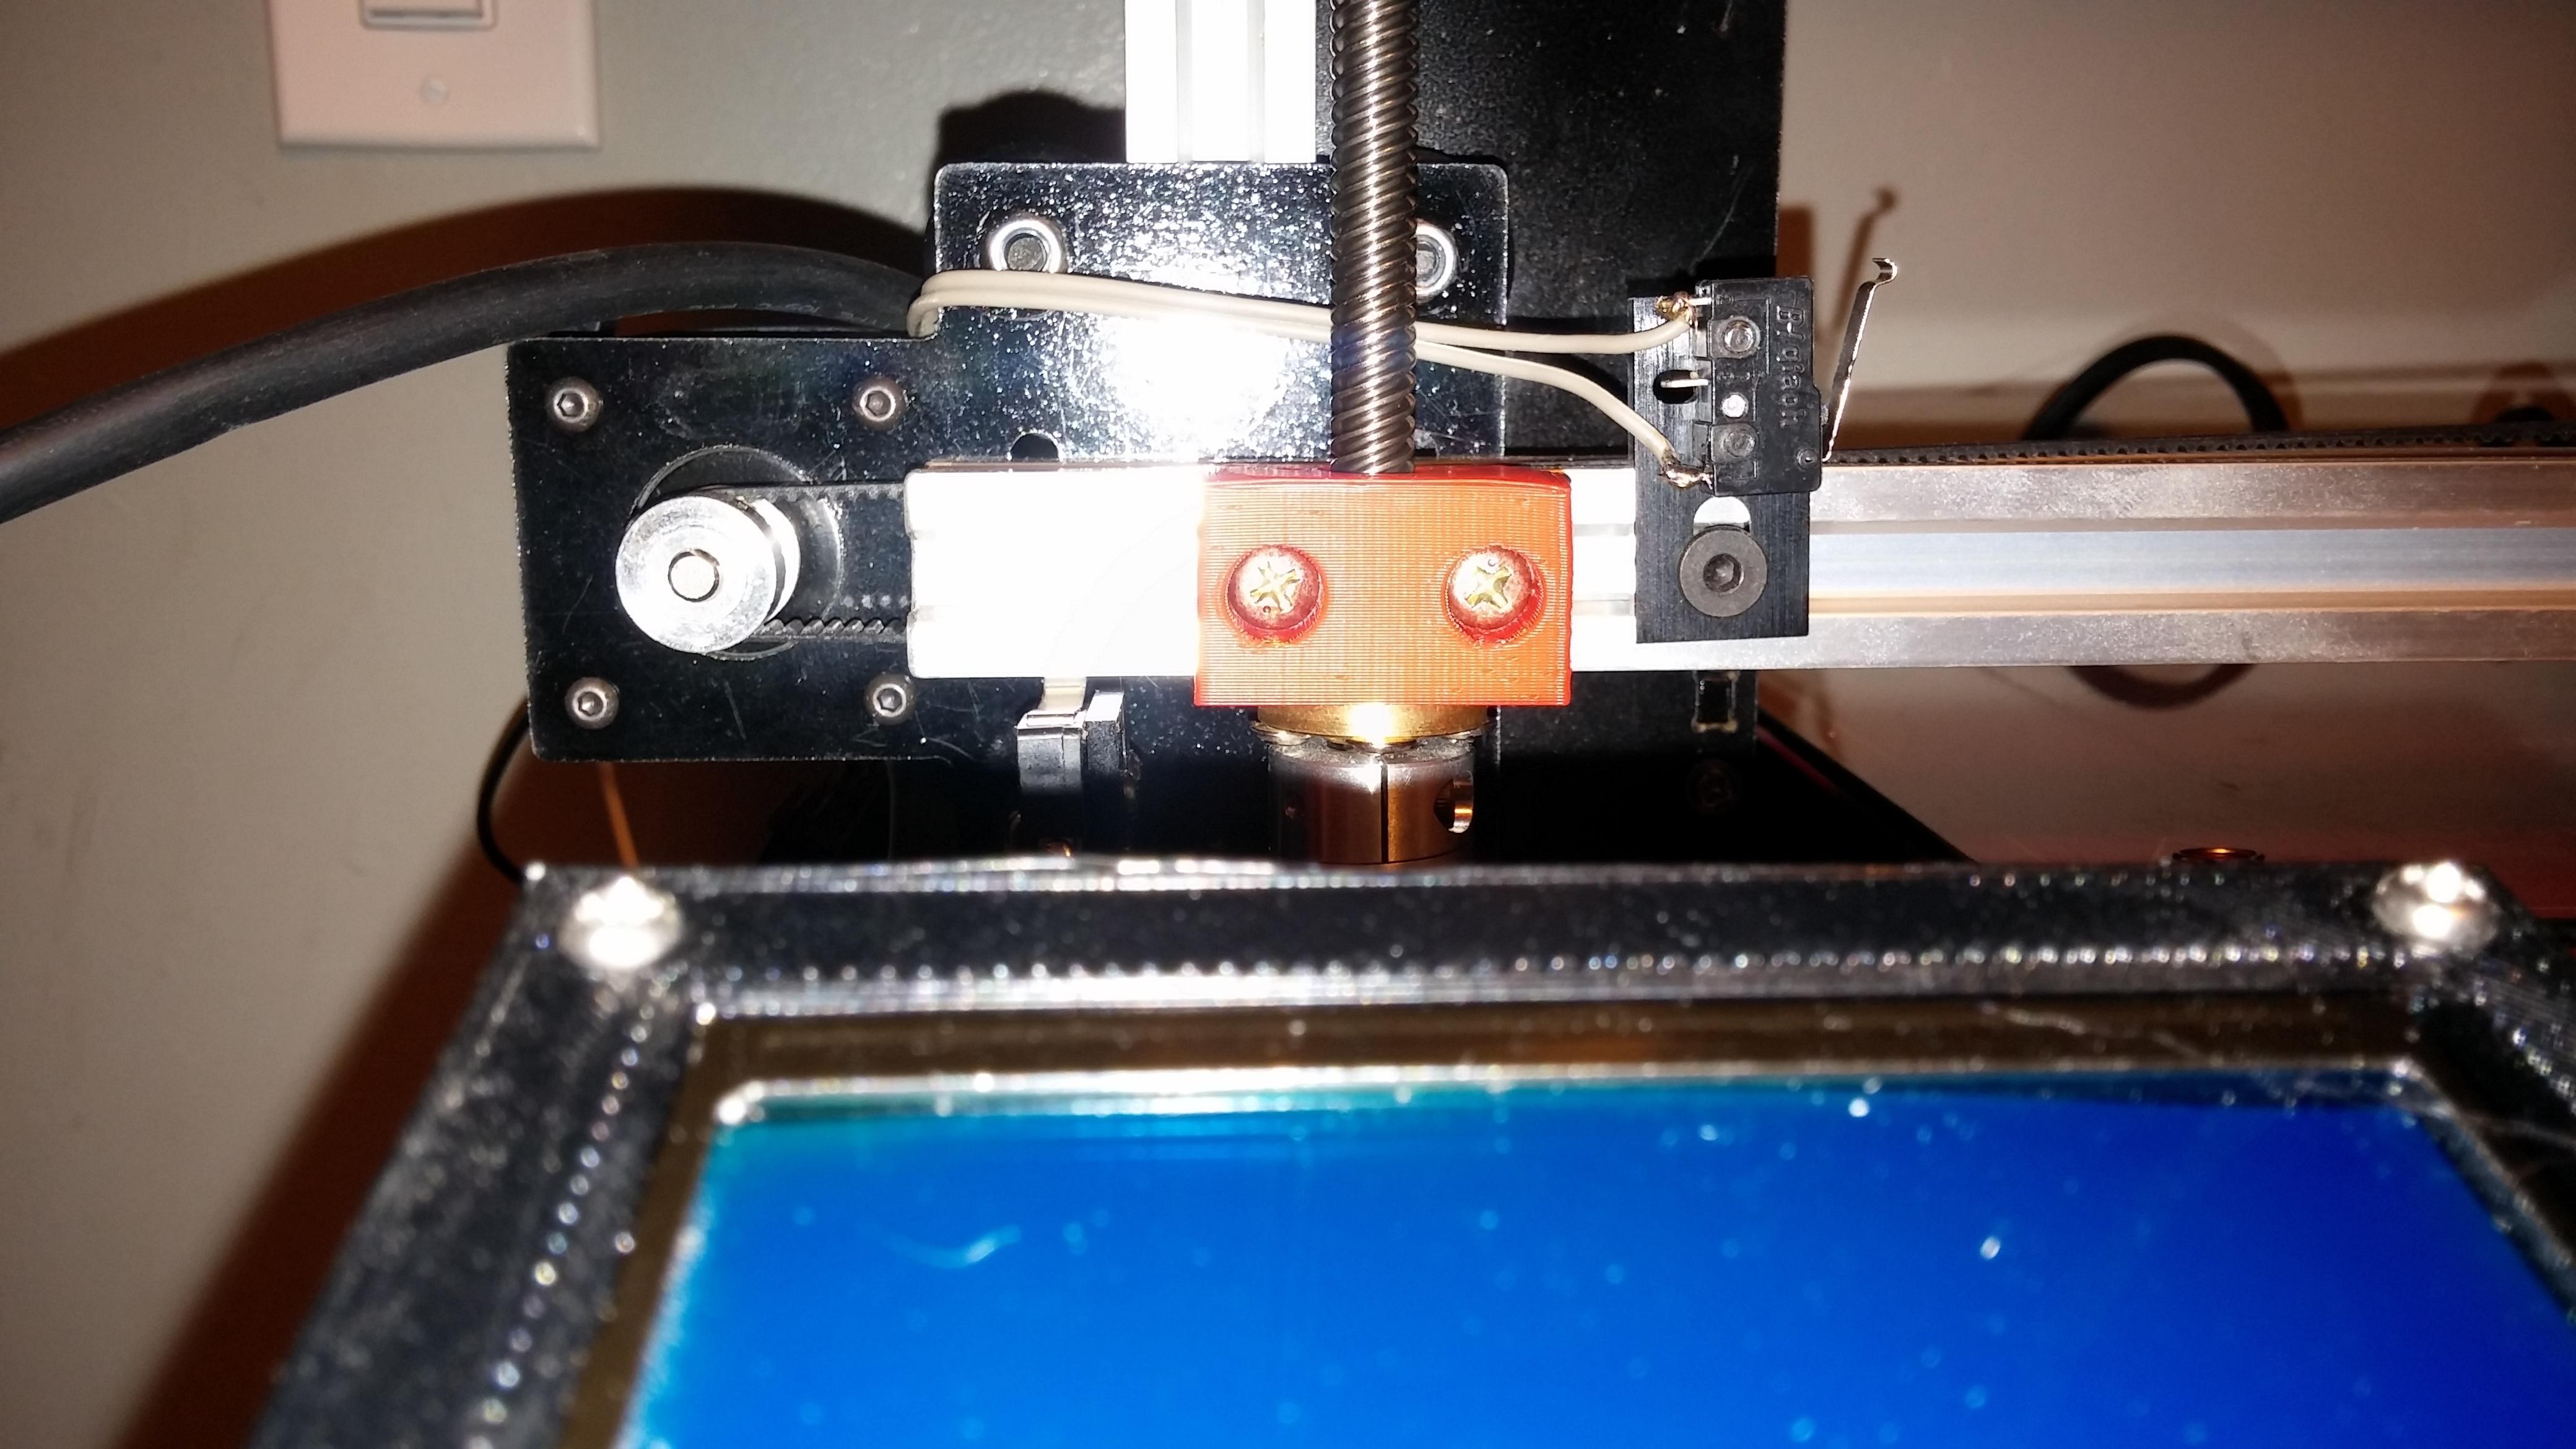 0309151646b.jpg Download free STL file NCS P3-v Steel Brass Lead screw mount • 3D print object, trentjw